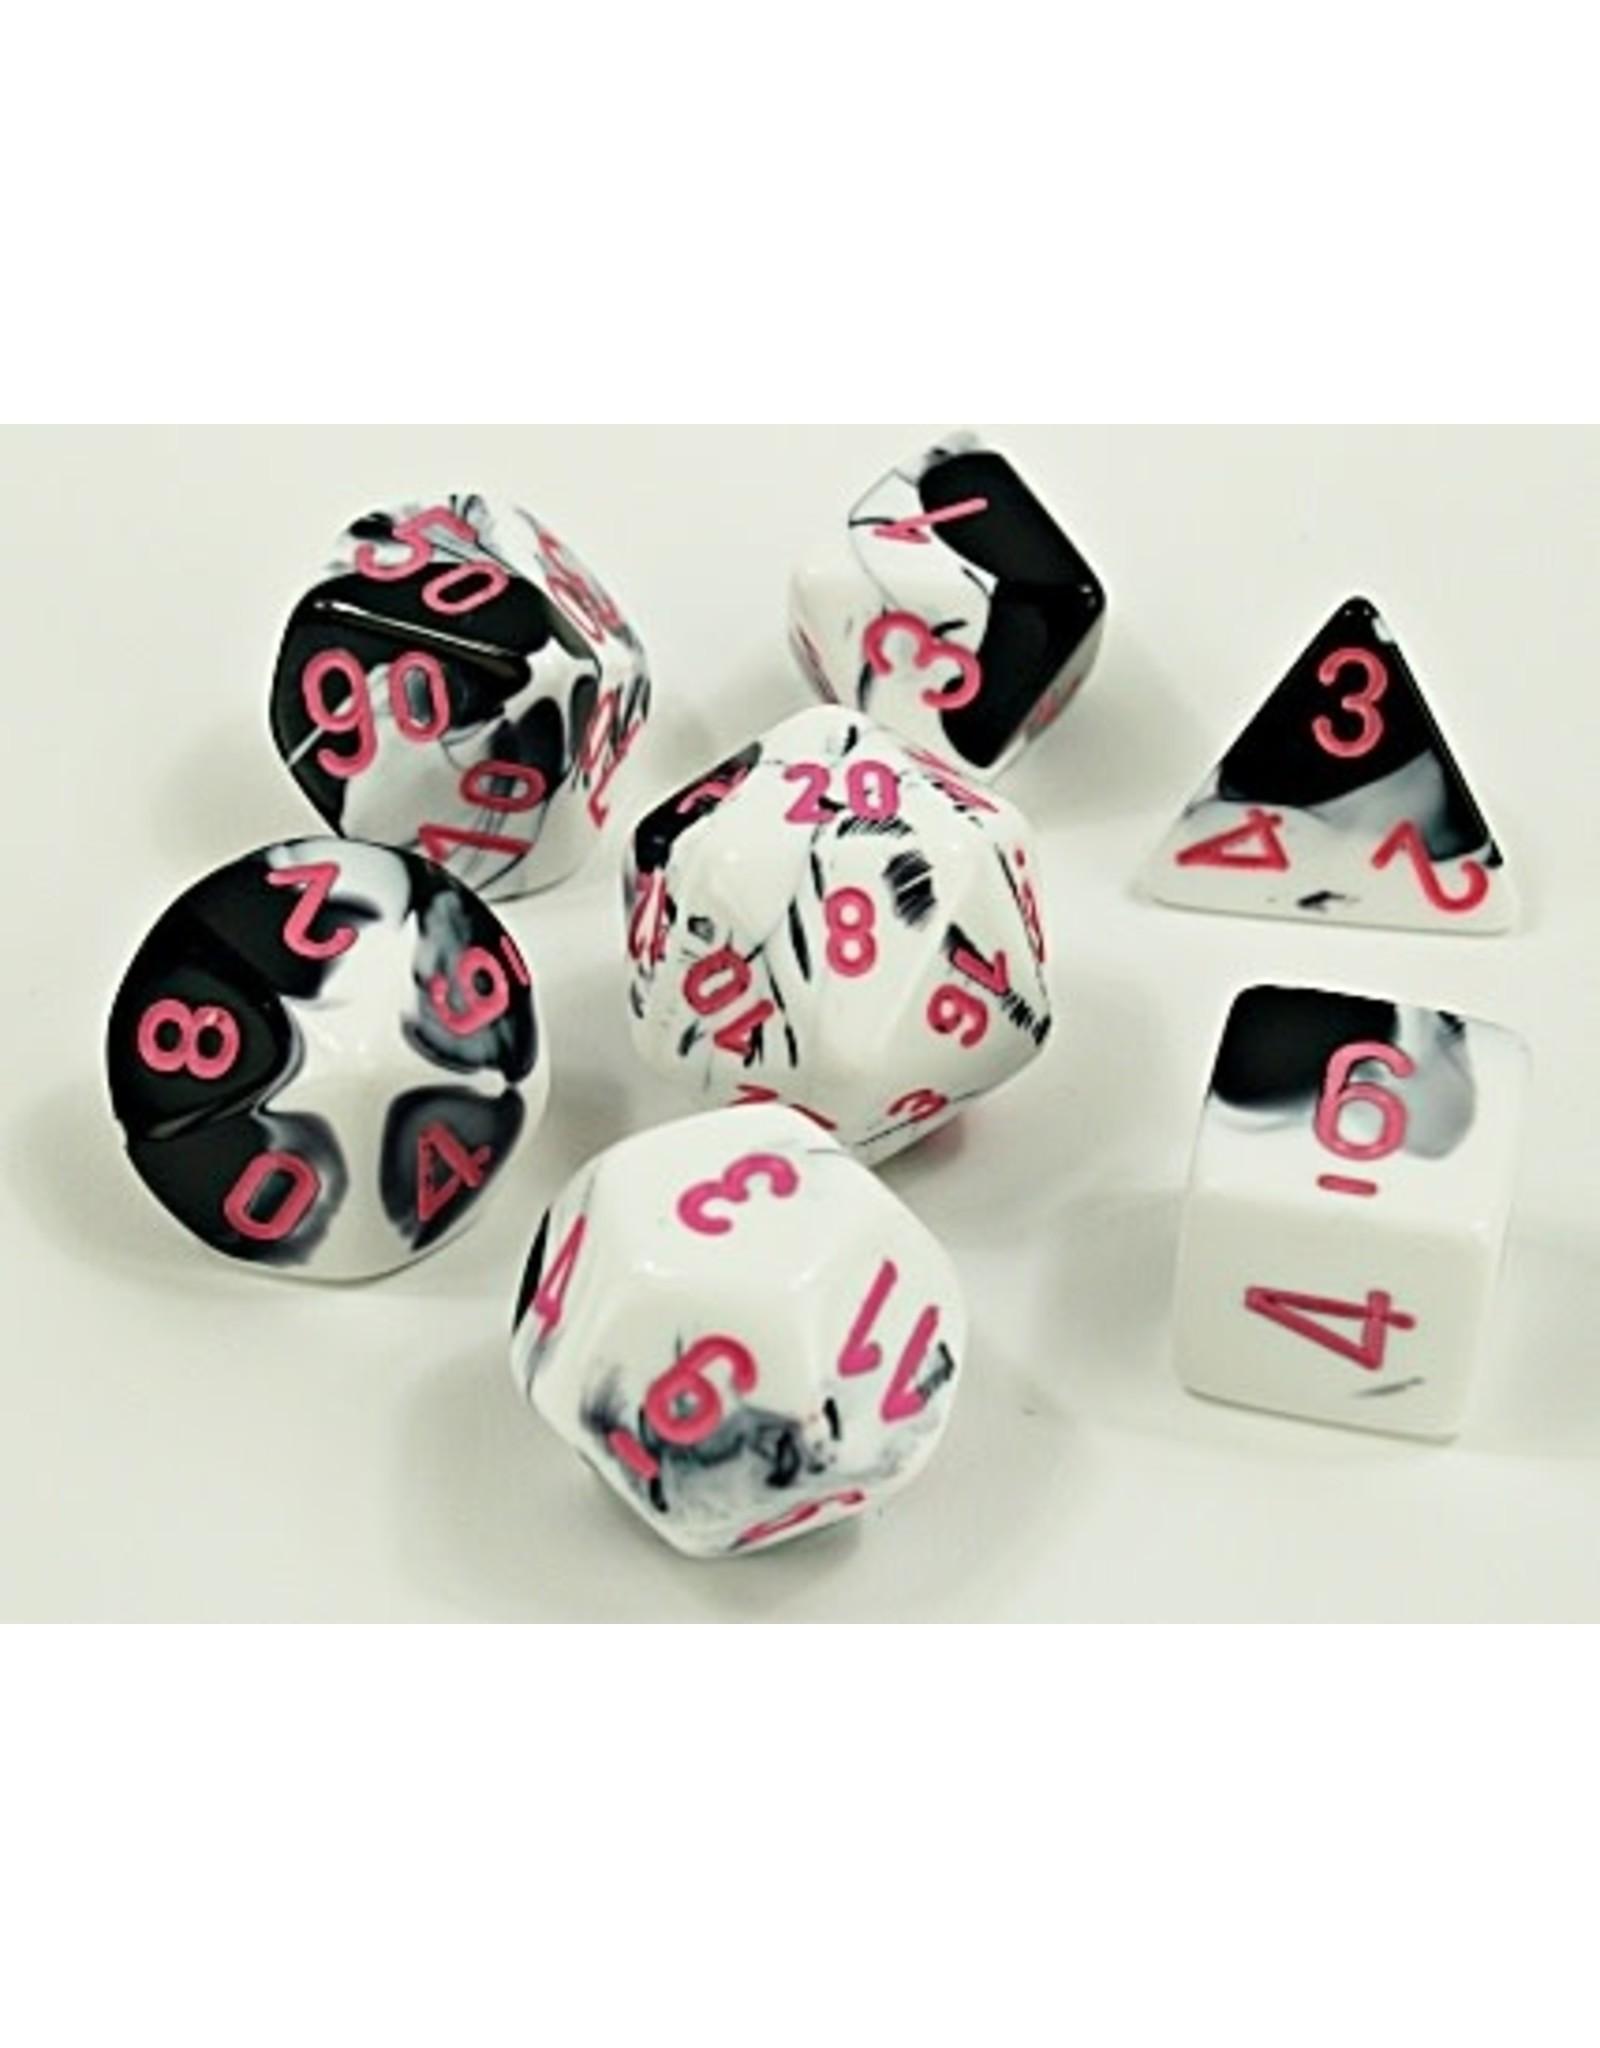 Chessex Chessex: 7-Die Set: Lab Dice: Gemini: Black-White/pink